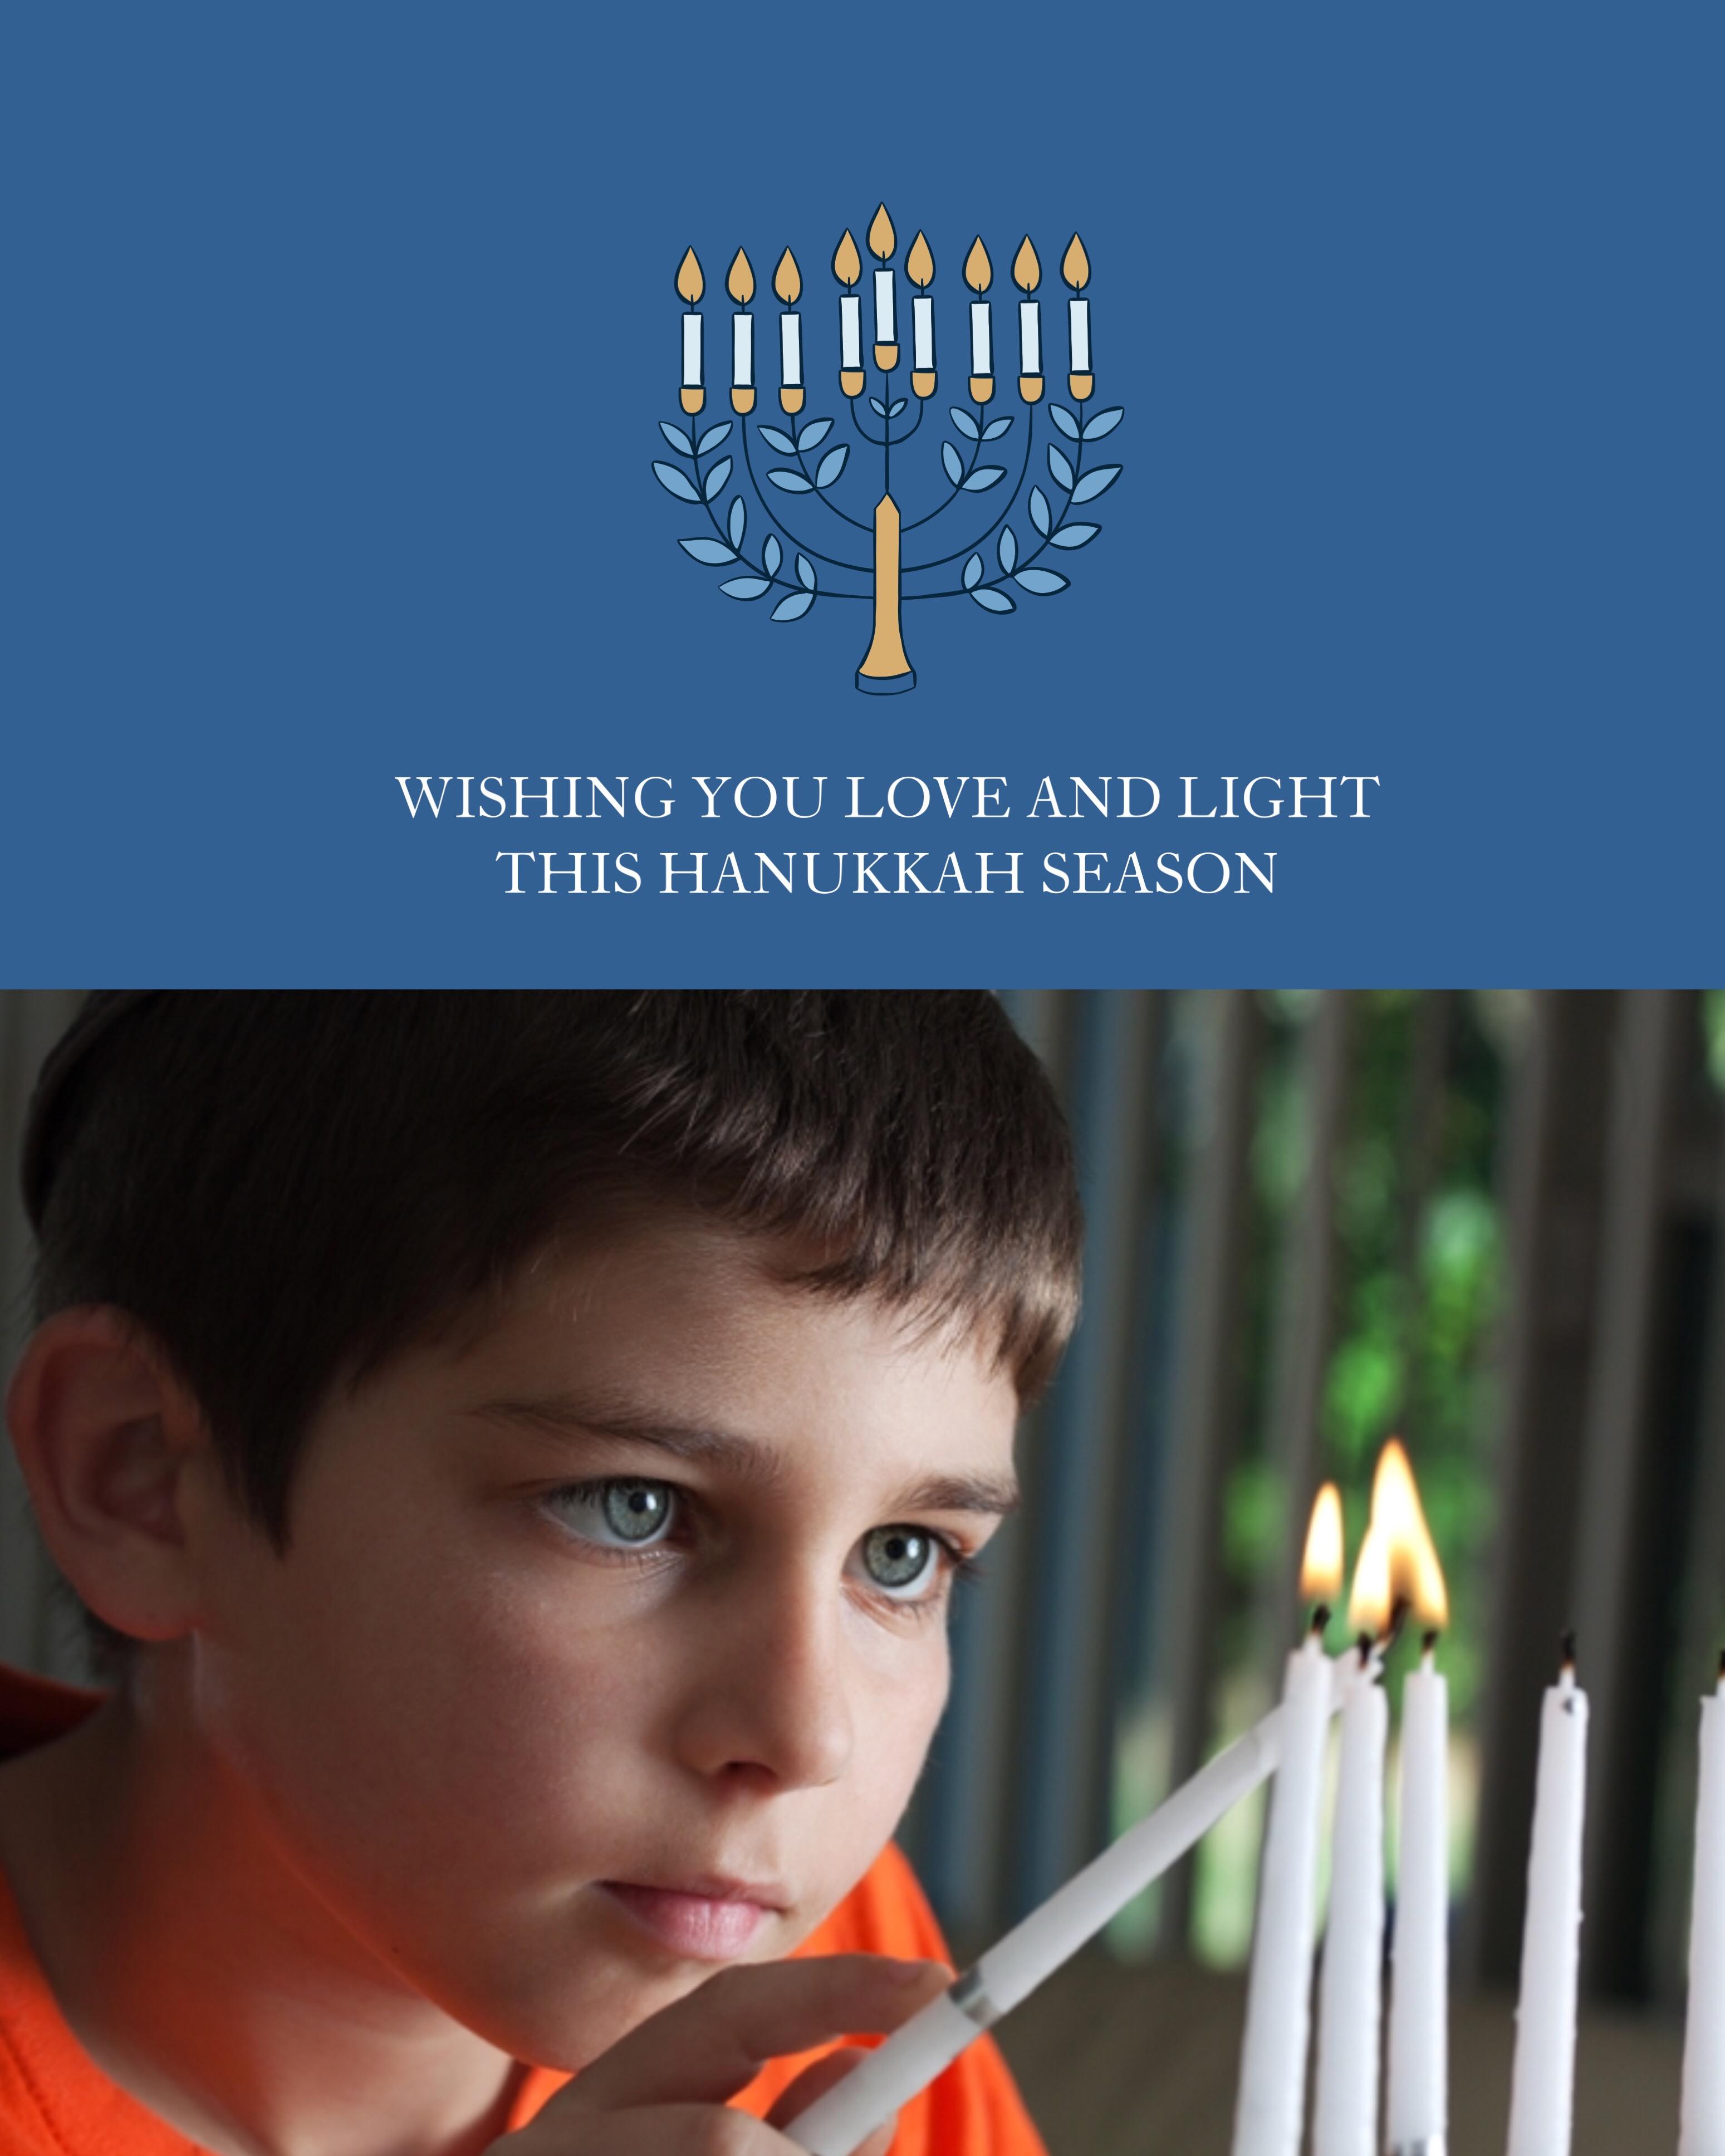 #hanukkah #freetoedit